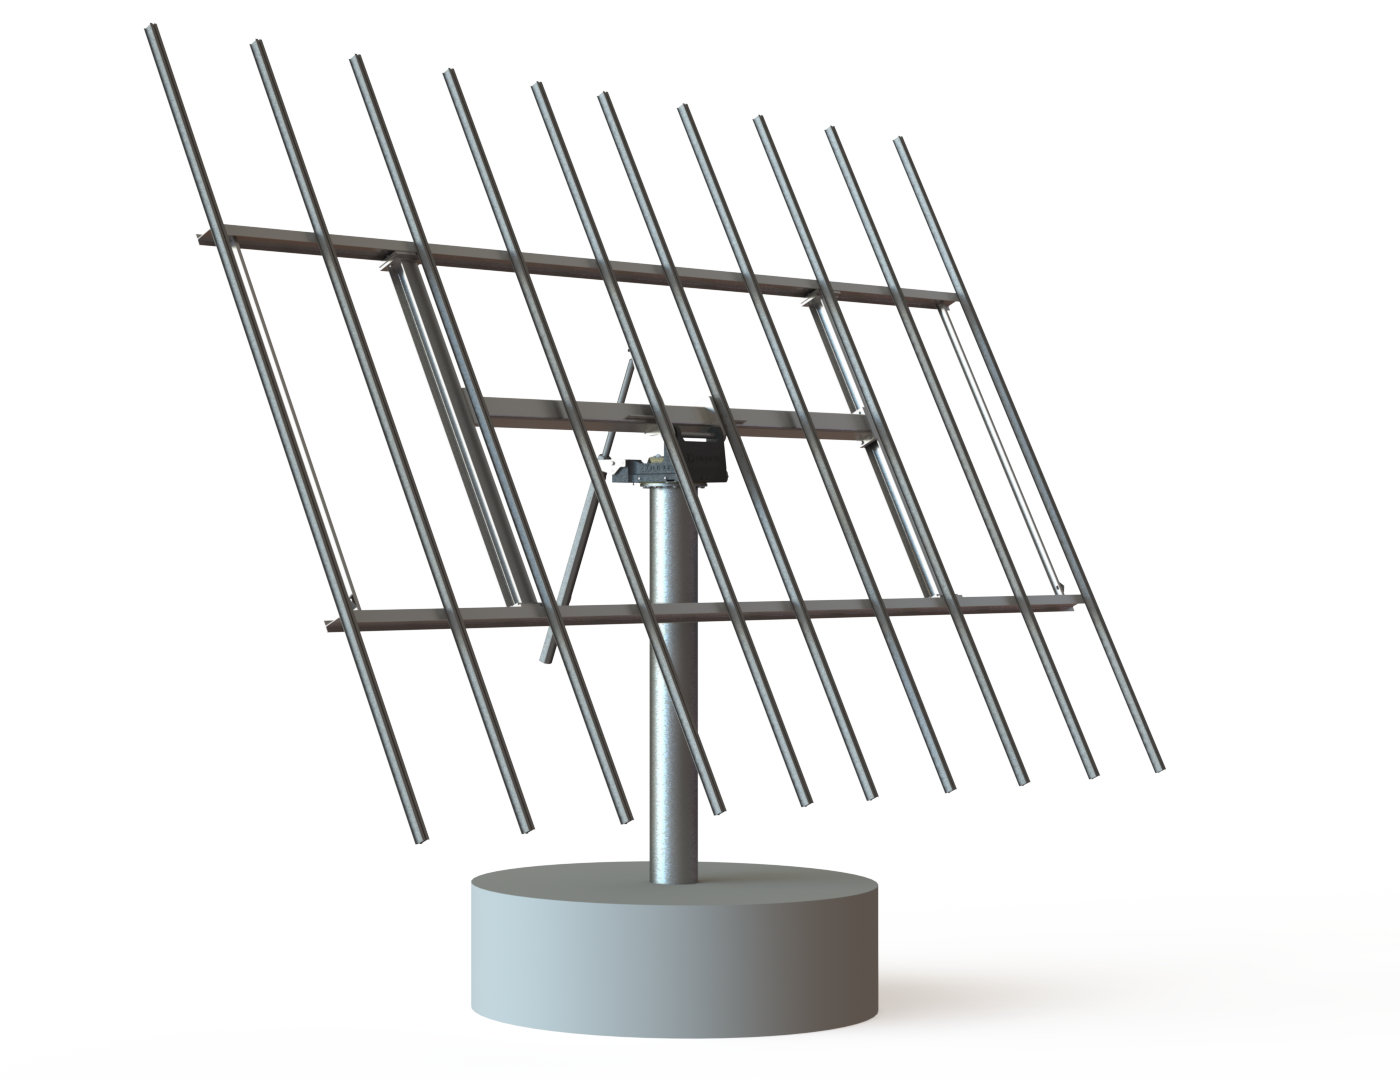 myCleantechSolarTracker™ Solaranalage - System 52 m2 - Betonsockel